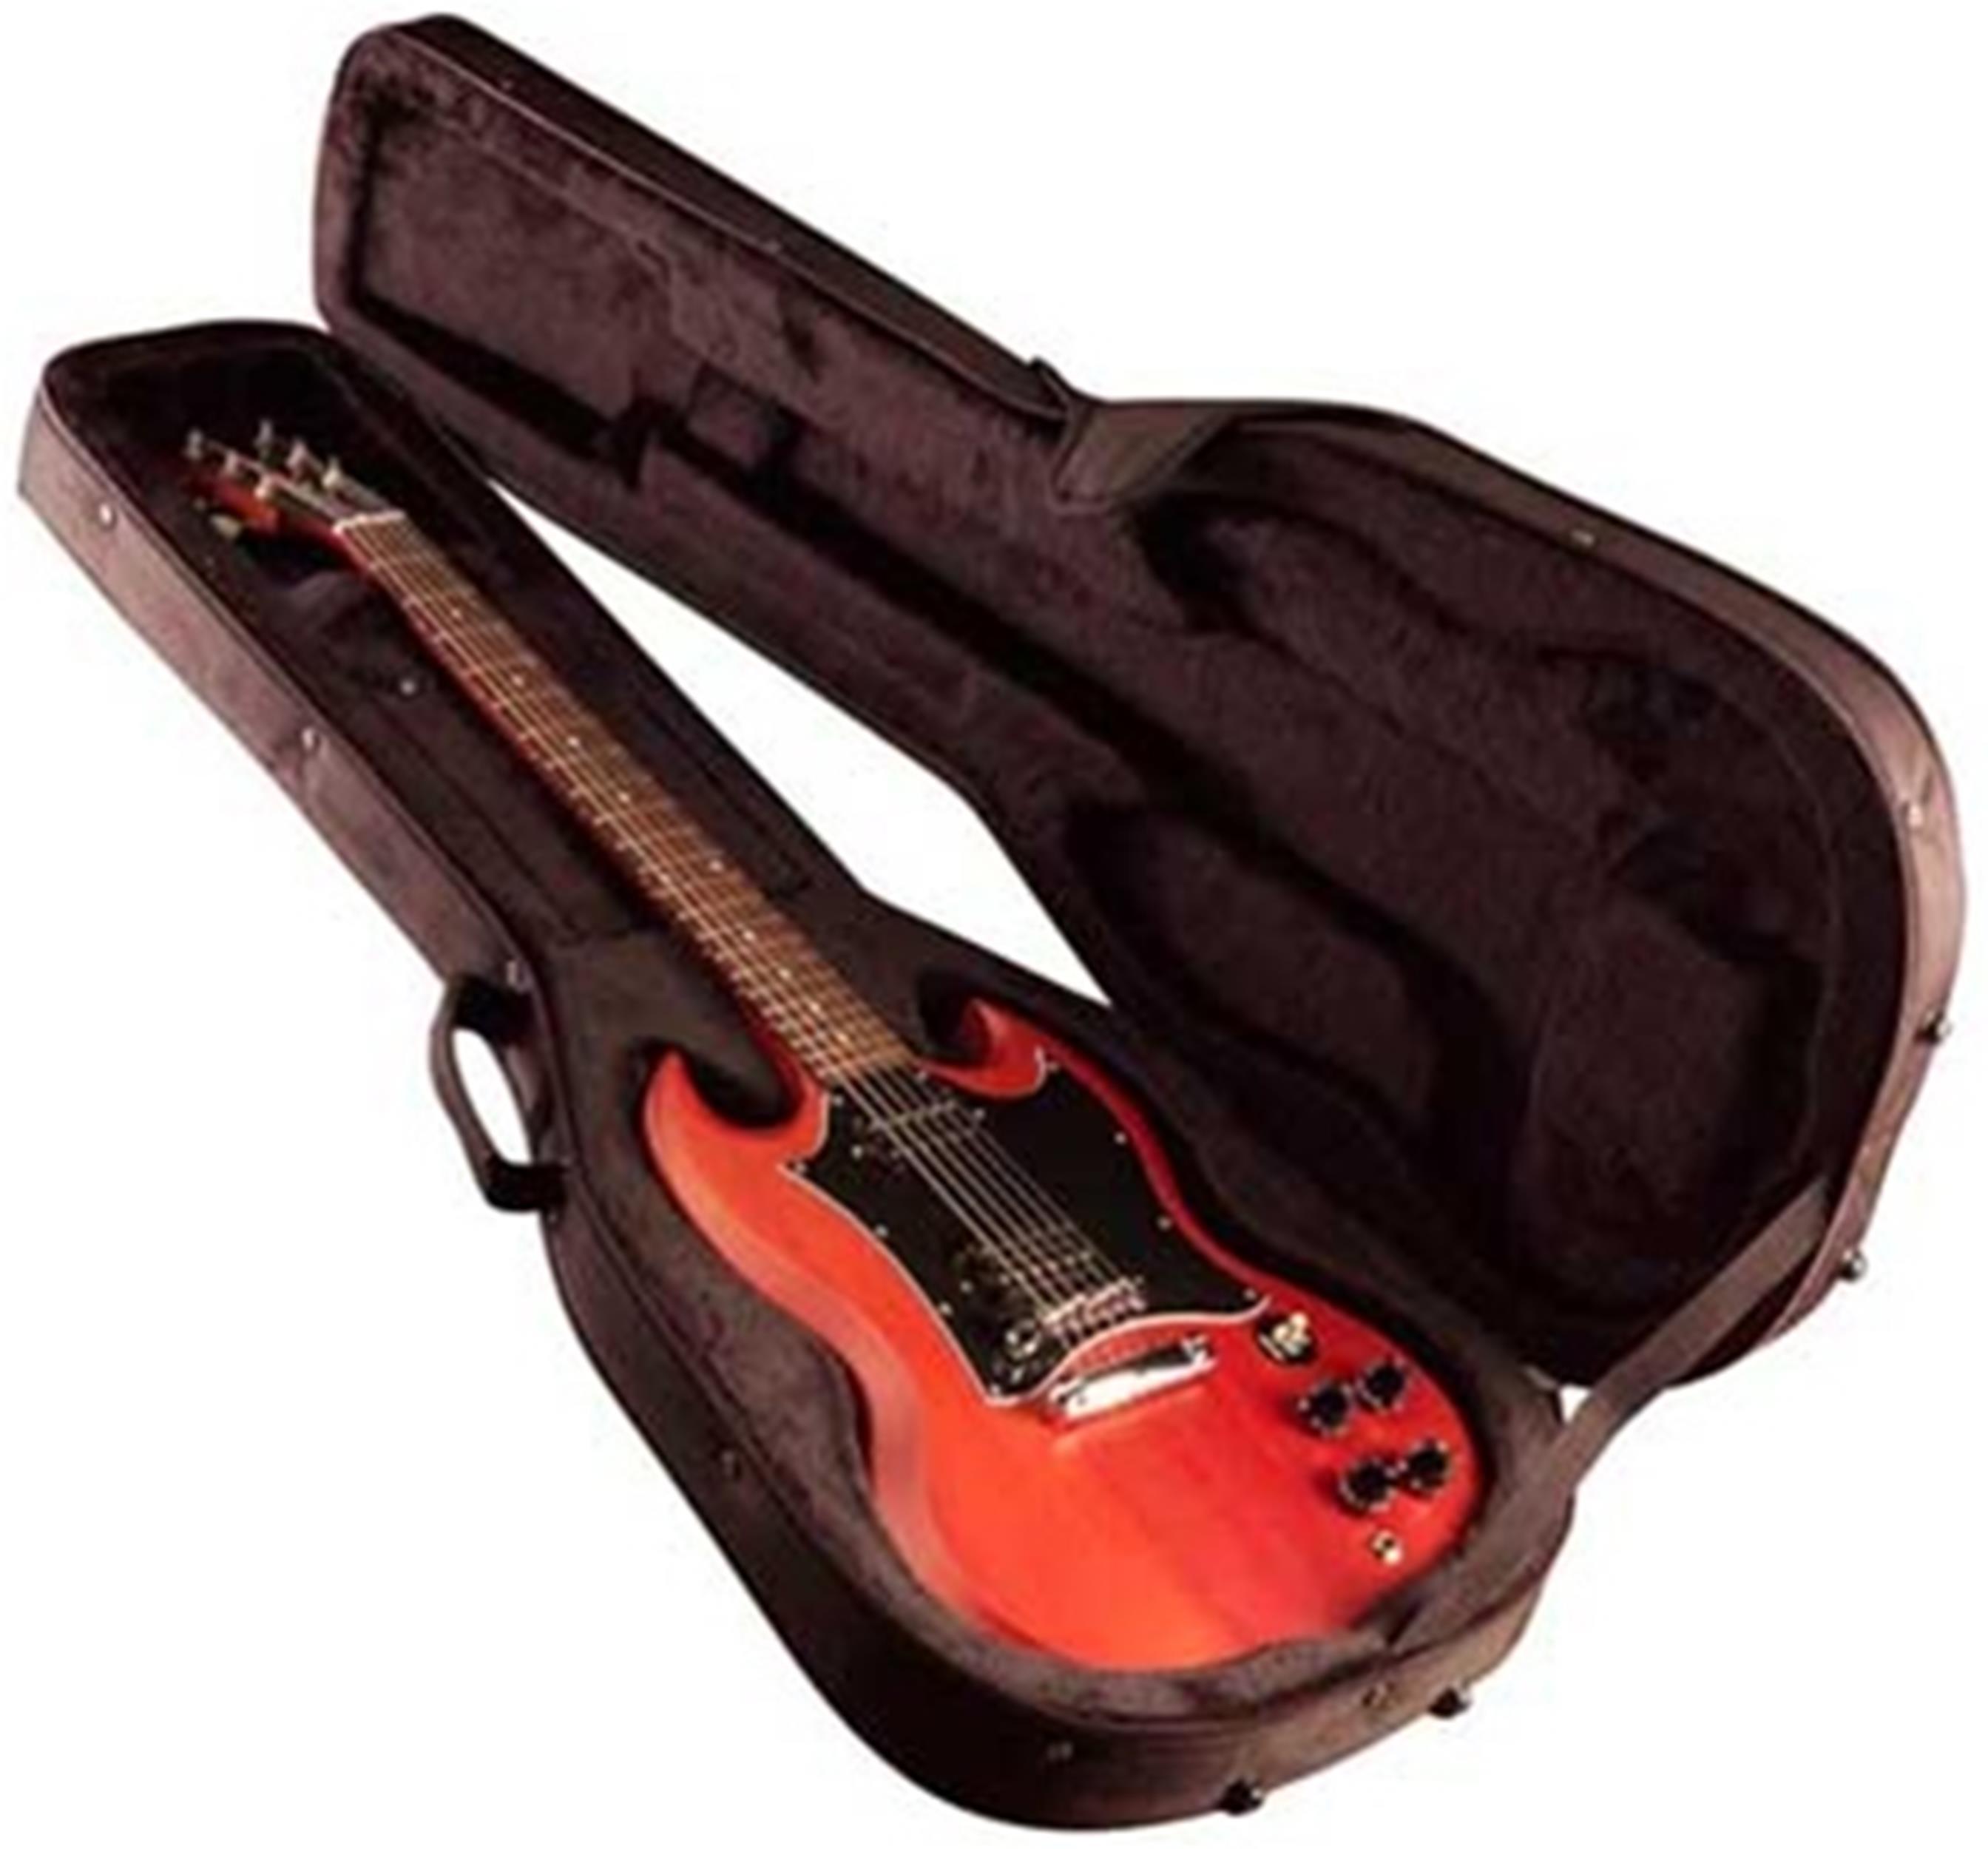 Gator-Cases-GL-SG-astuccio-light-per-chitarra-elettrica-tipo-Gibson-SG-sku-2757722418011